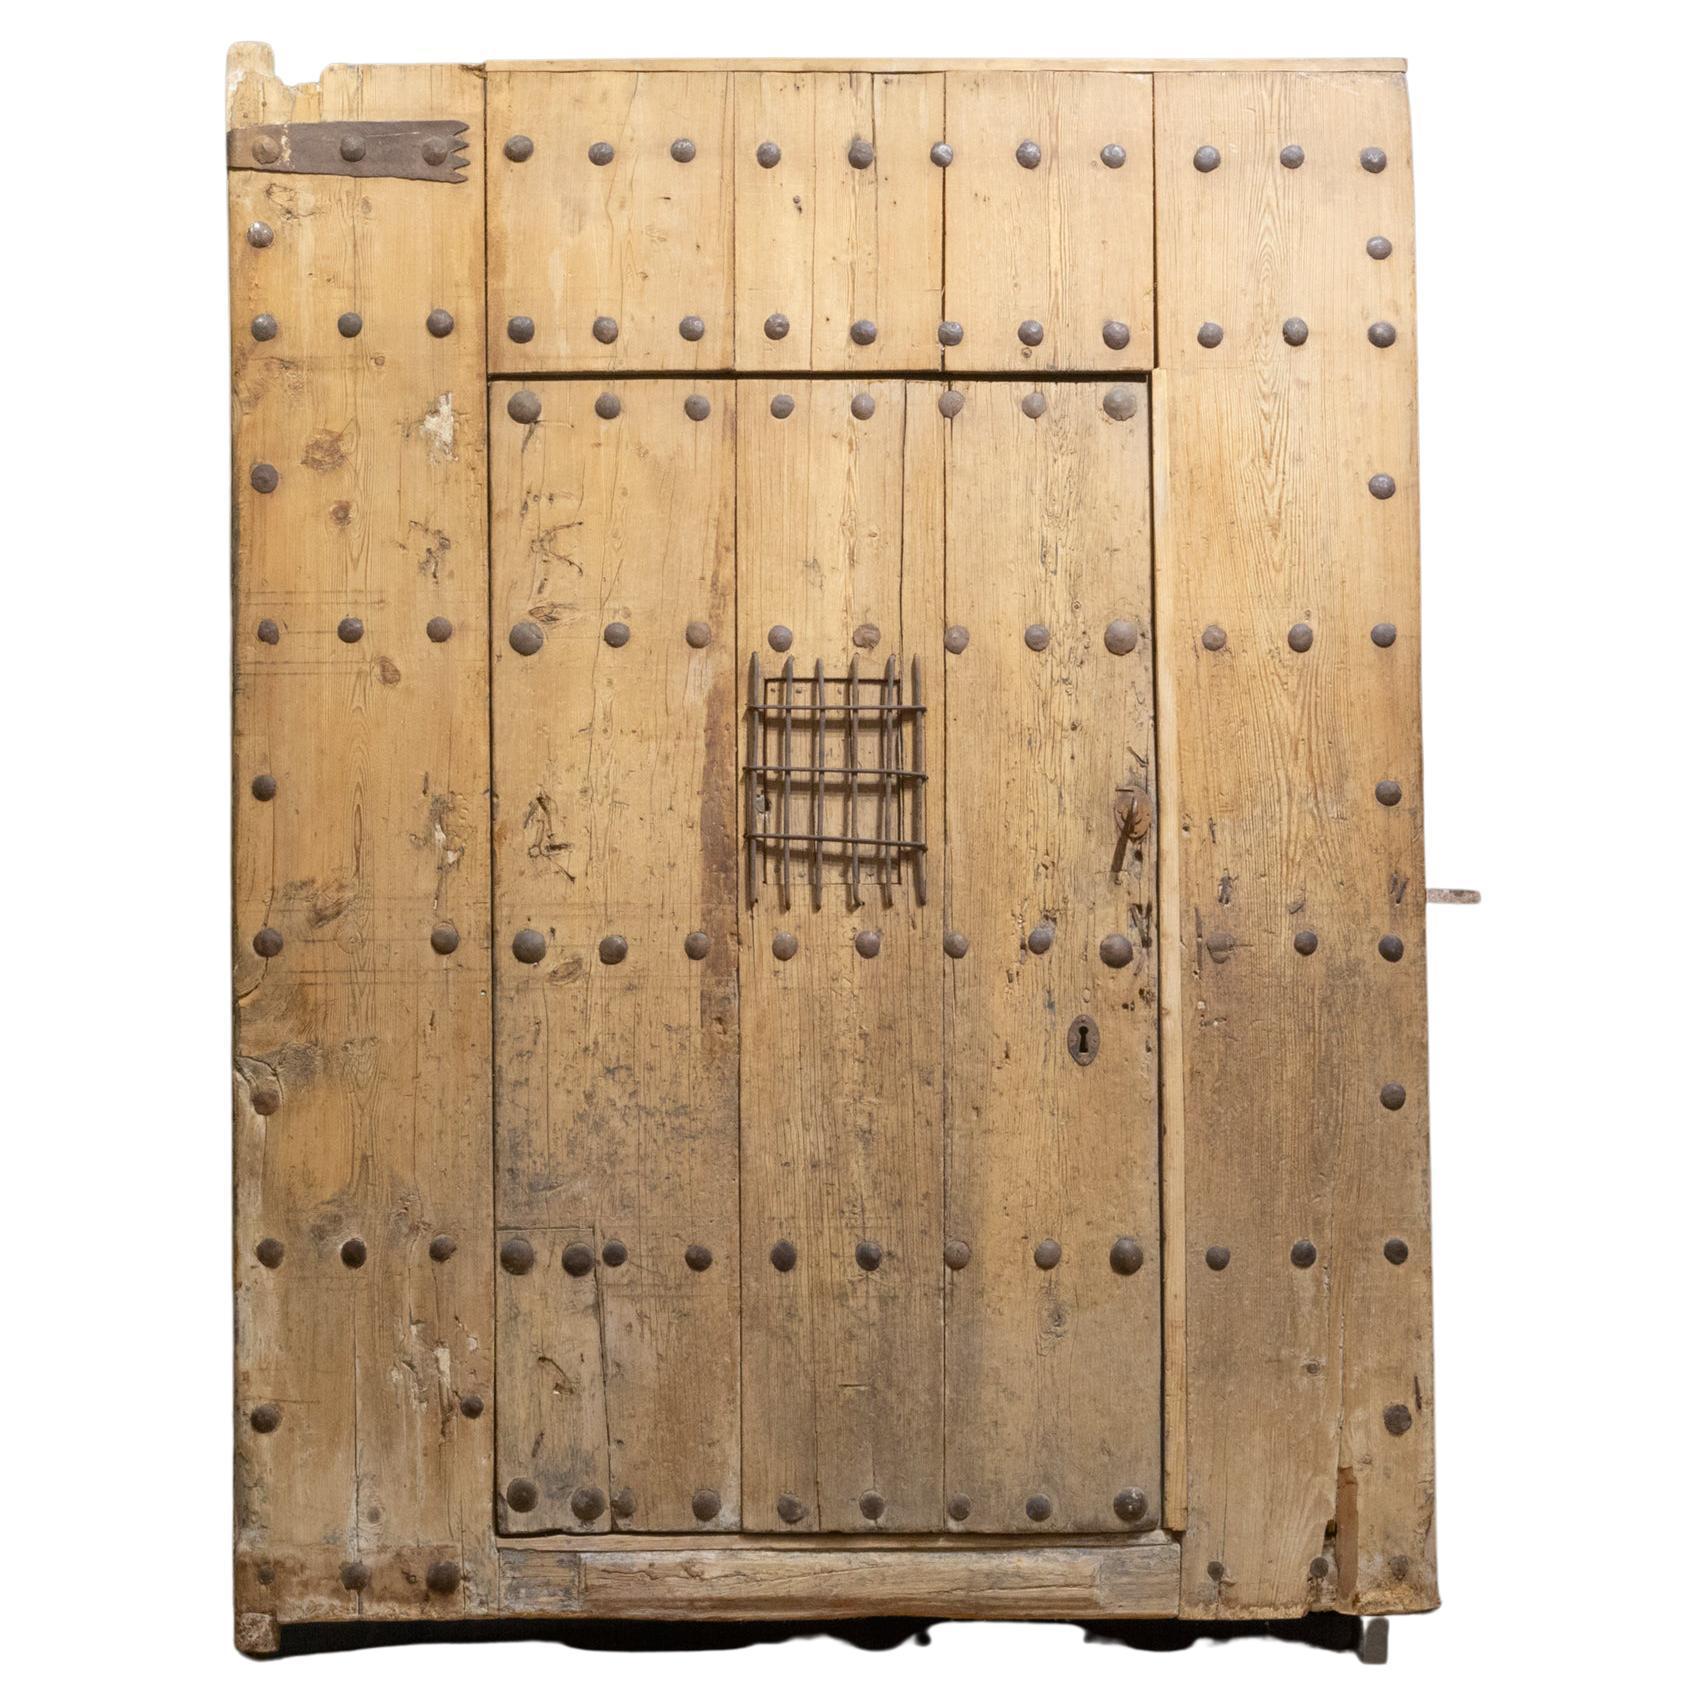 Antique 18th c. Wood and Iron Spanish Porch Door with Interior Door, c.1700s